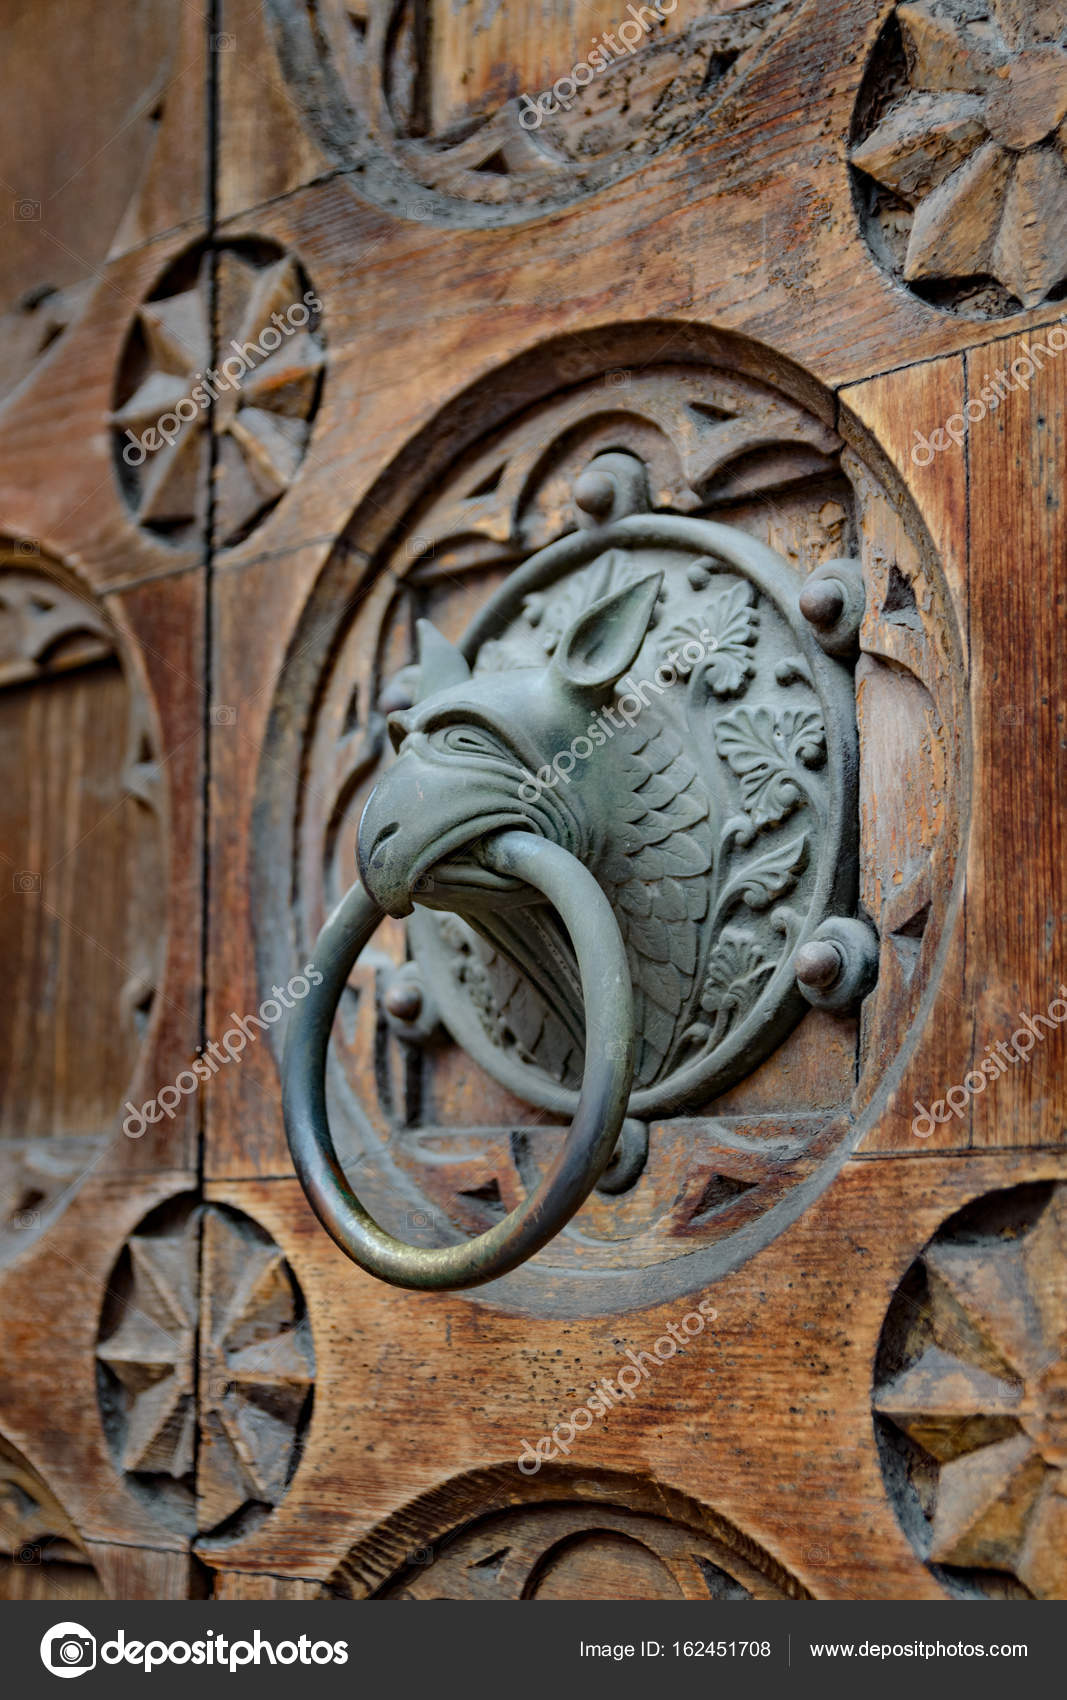 Antique door knocker shaped like monster's head. — Photo by Isaac74 - Antique Door Knocker Shaped Monster's Head. — Stock Photo © Isaac74